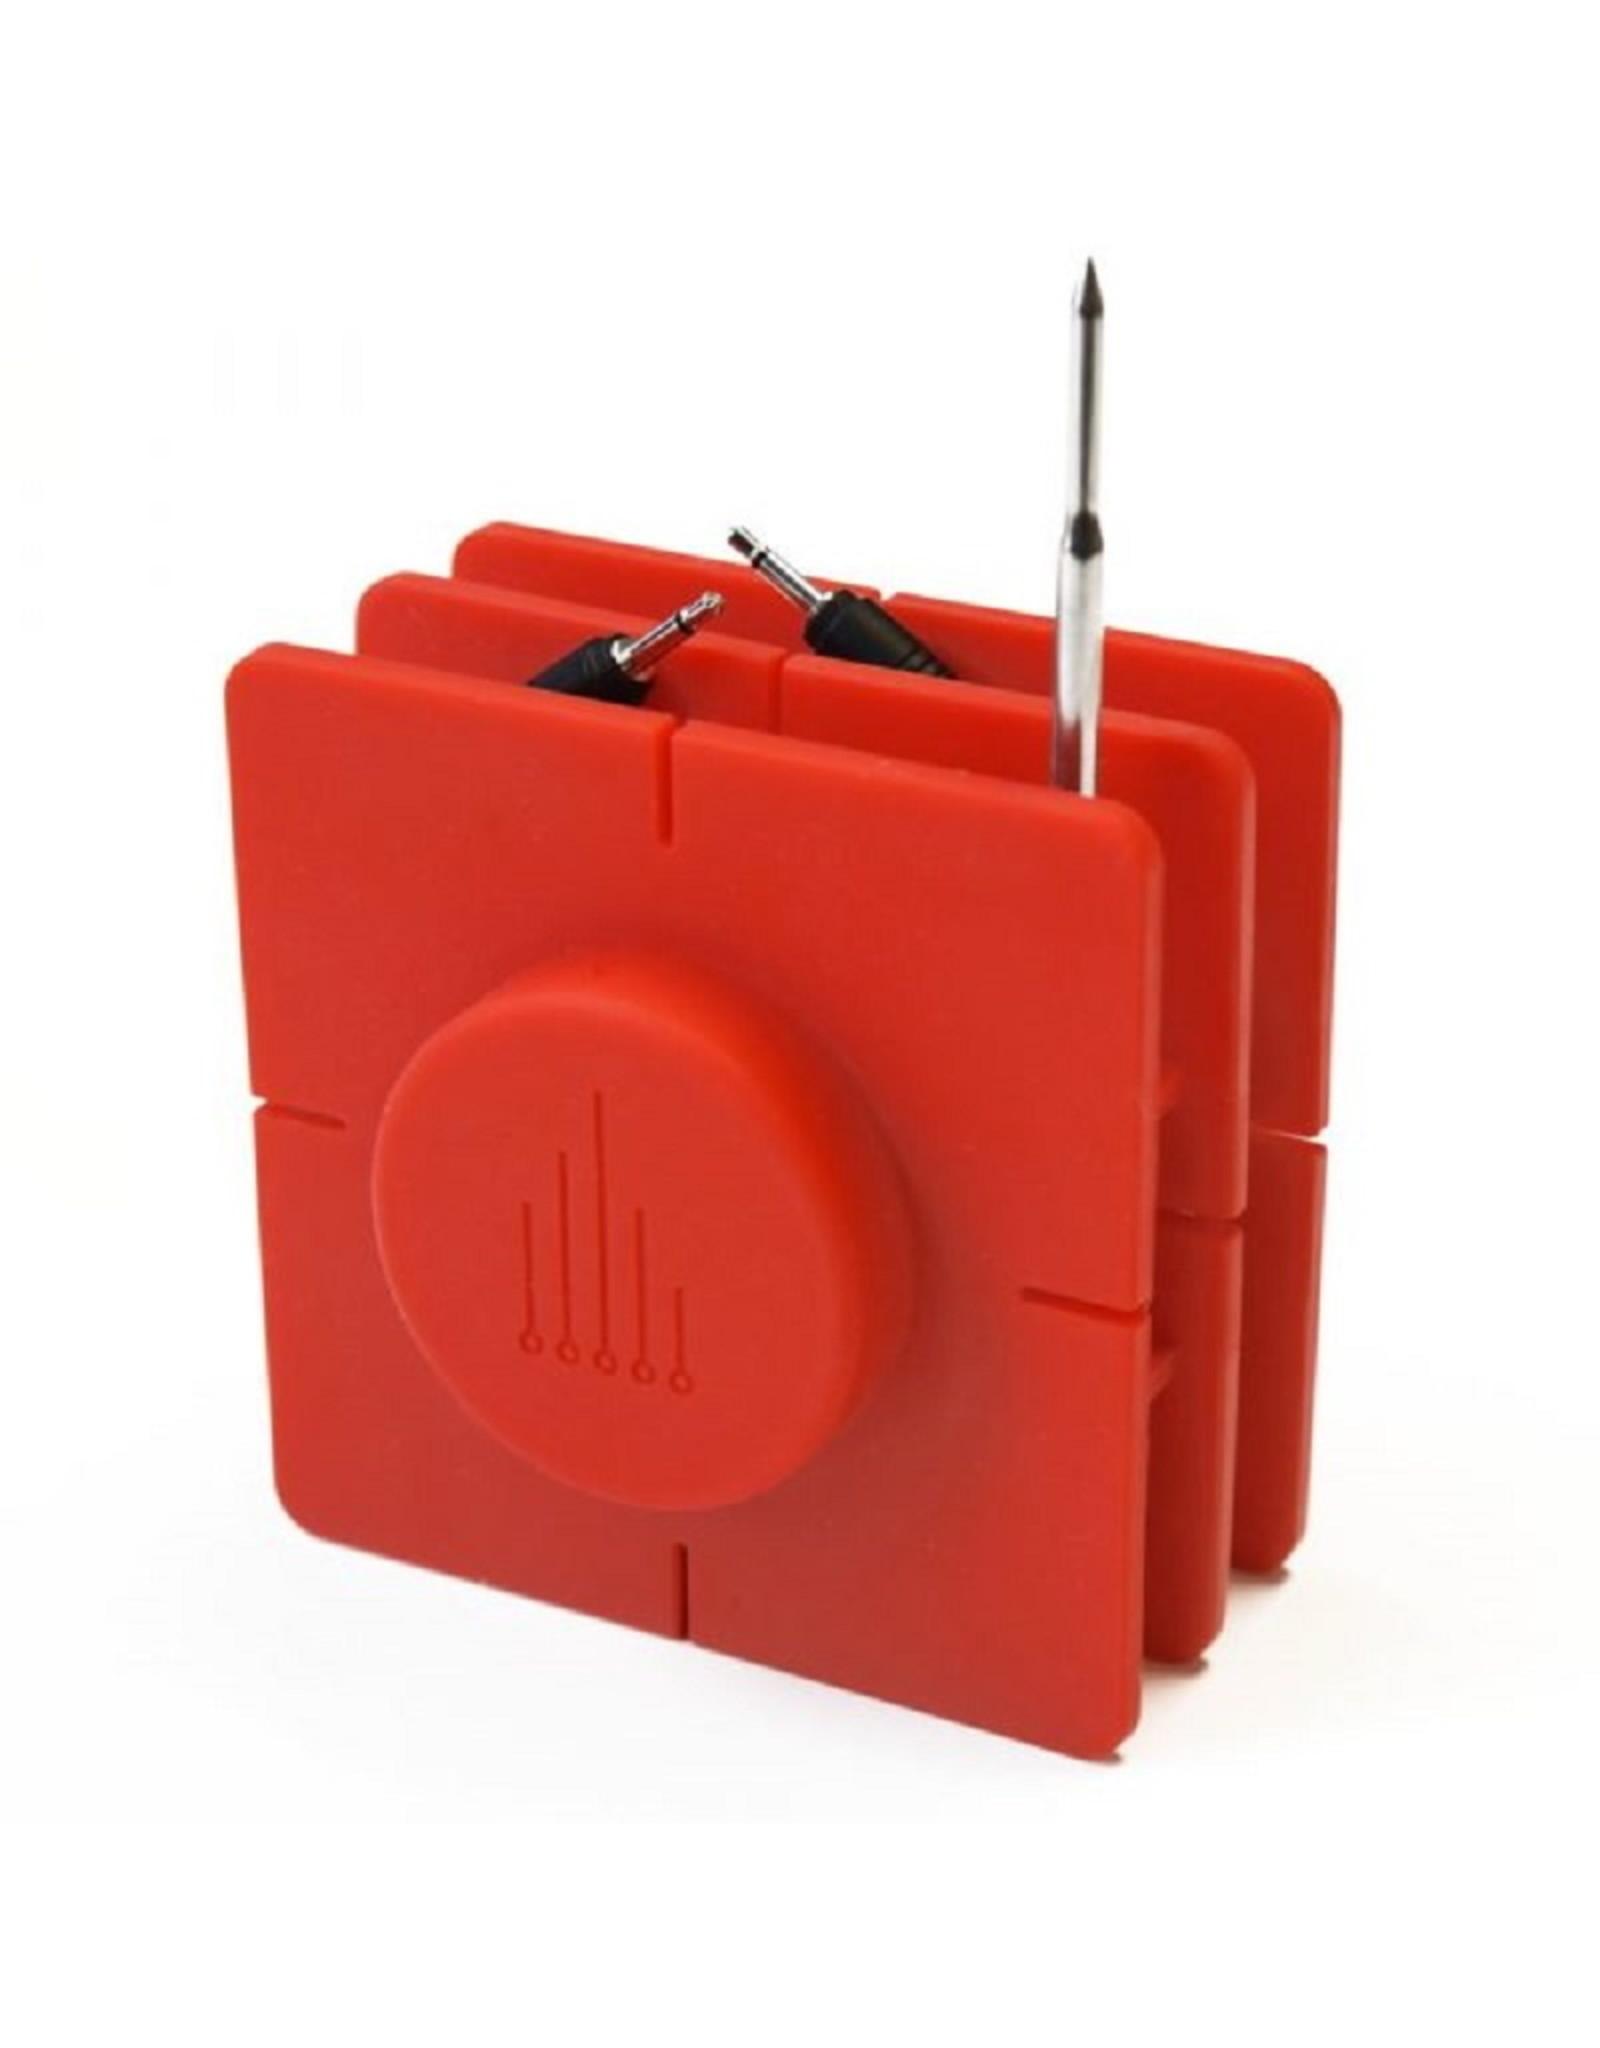 FireBoard Probe Organizer